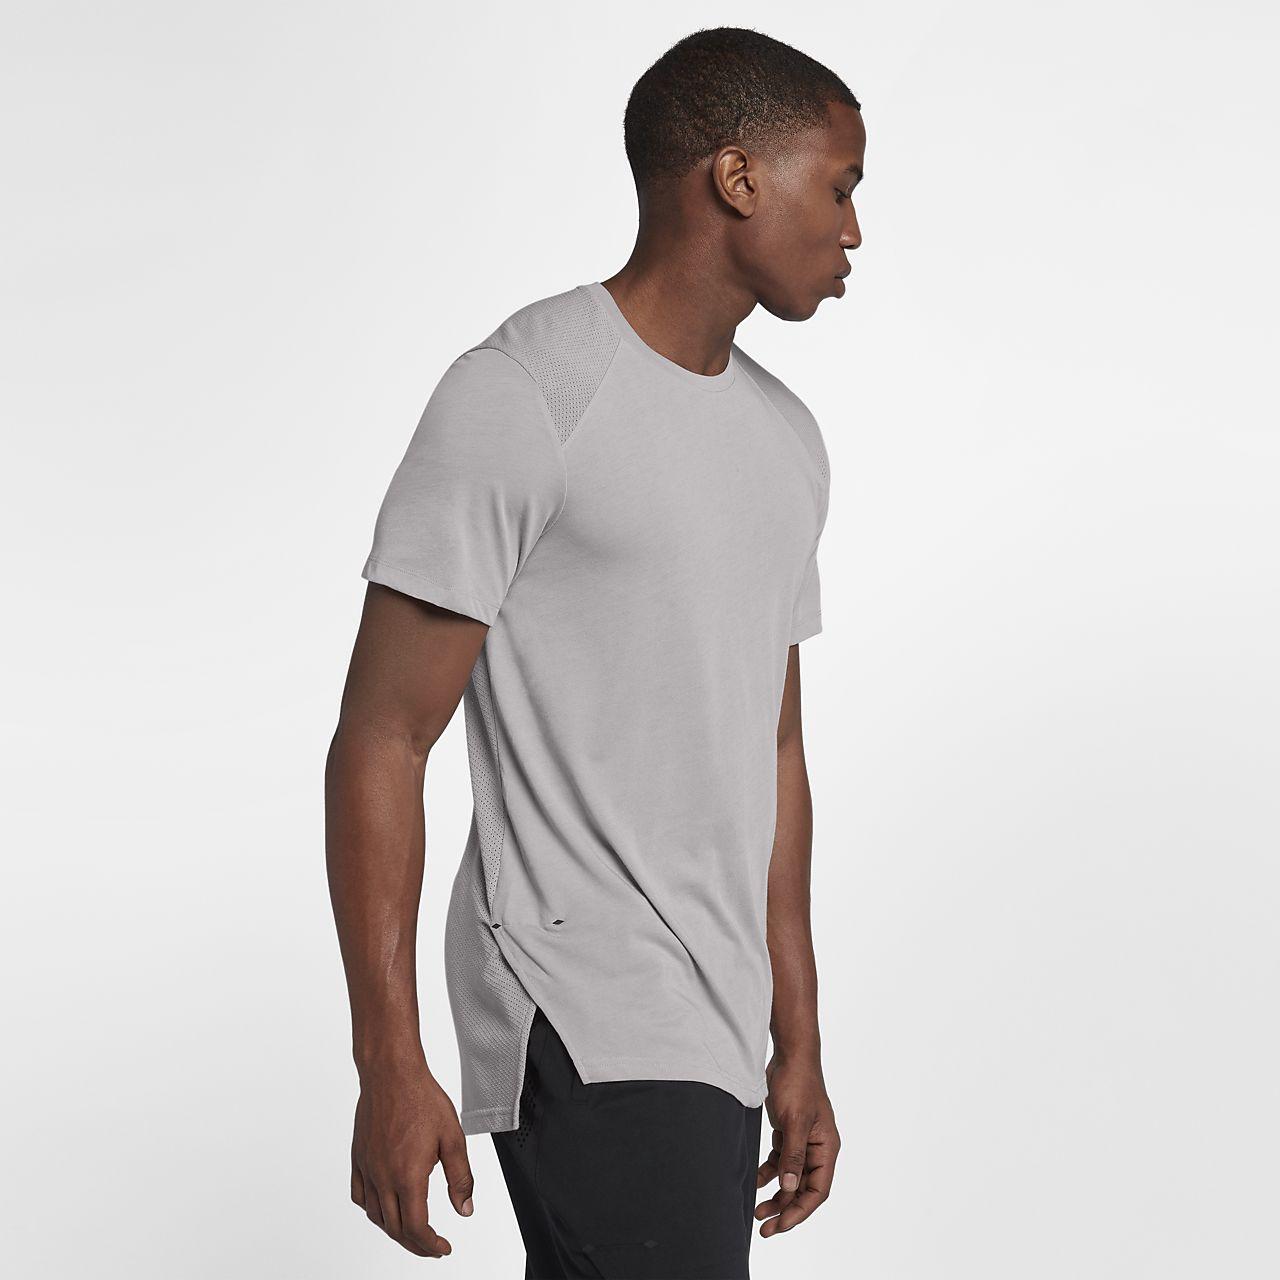 aca85bce6172 Nike Breathe Elite Men s Short-Sleeve Basketball Top. Nike.com IN